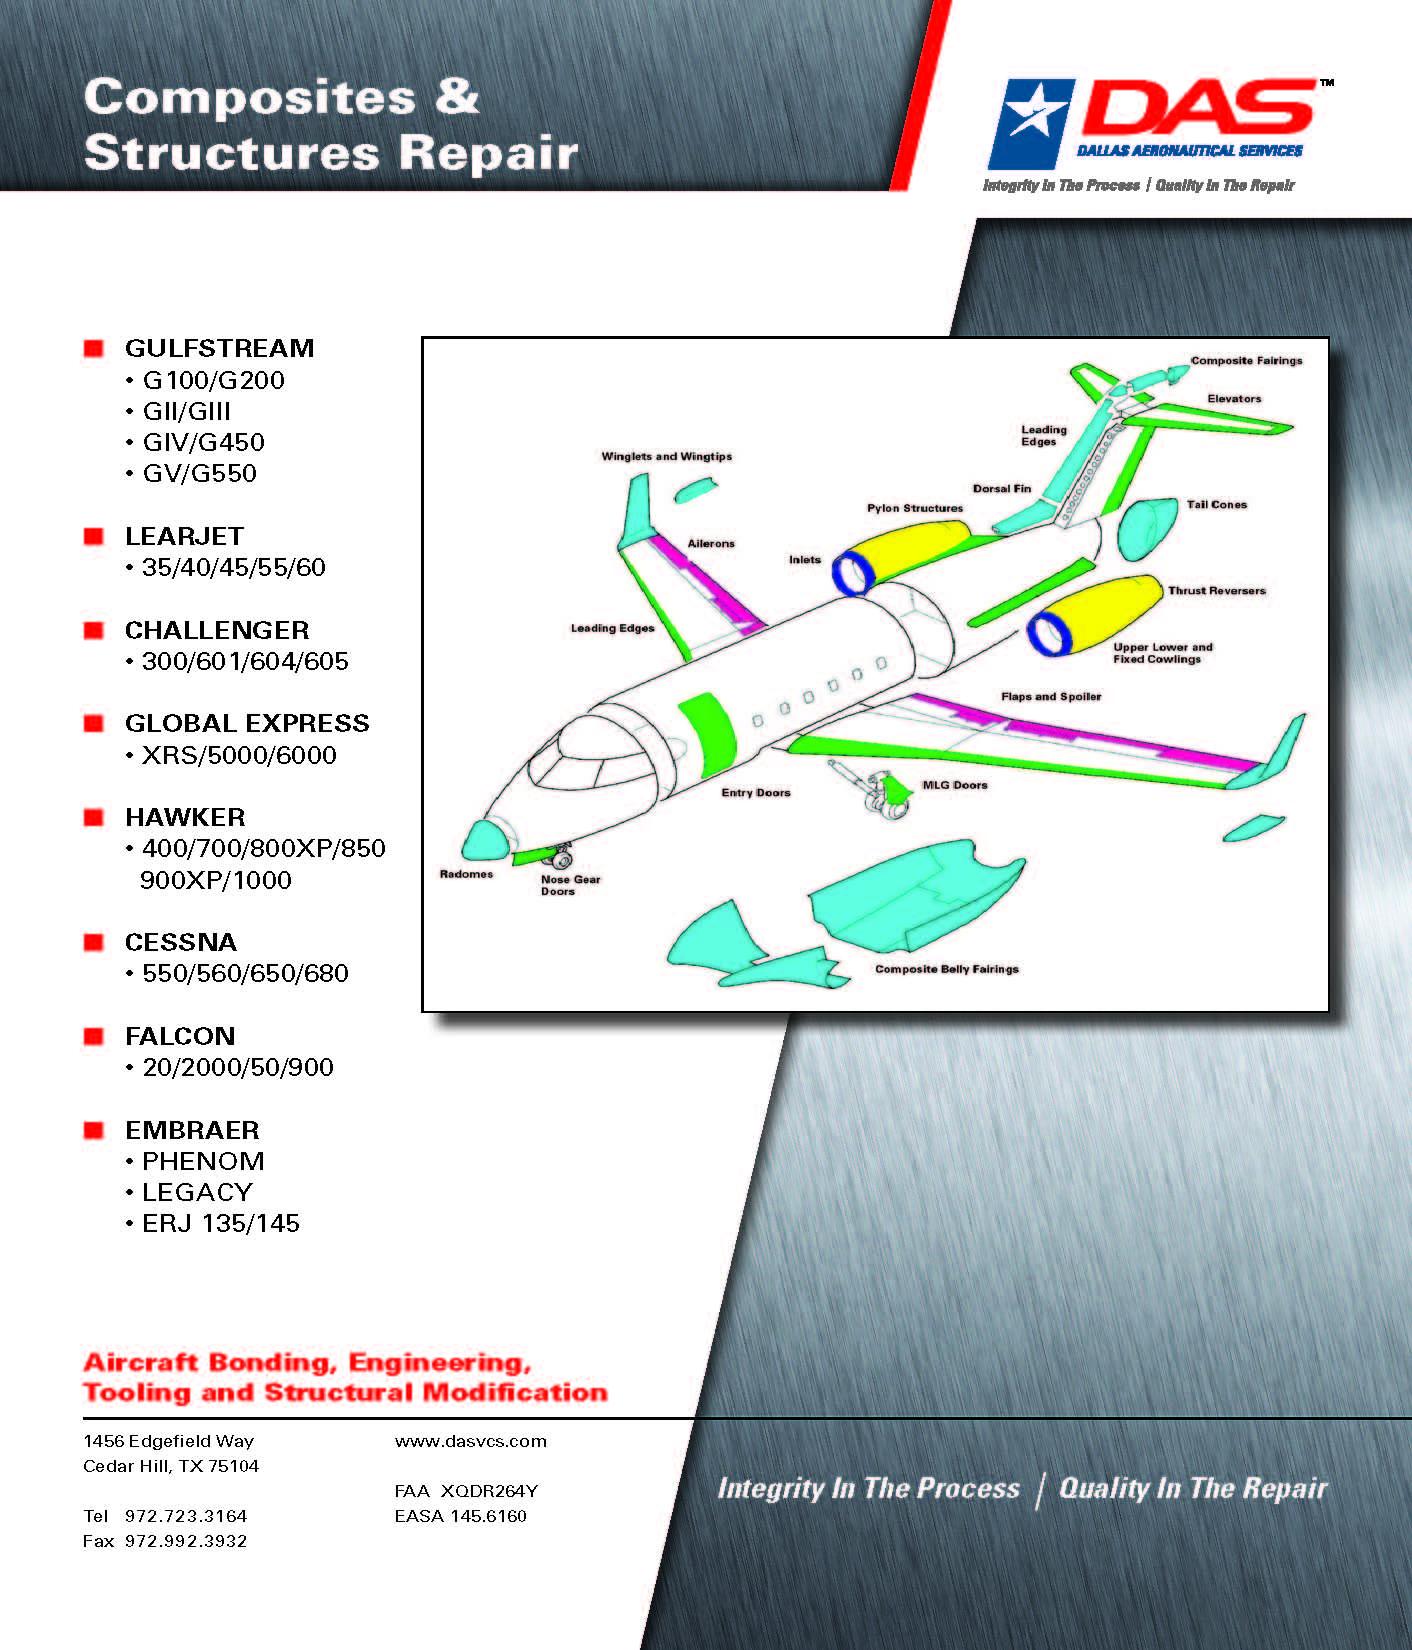 DAS-Composites_Structures Repair sheet F4-LR corp.jpg